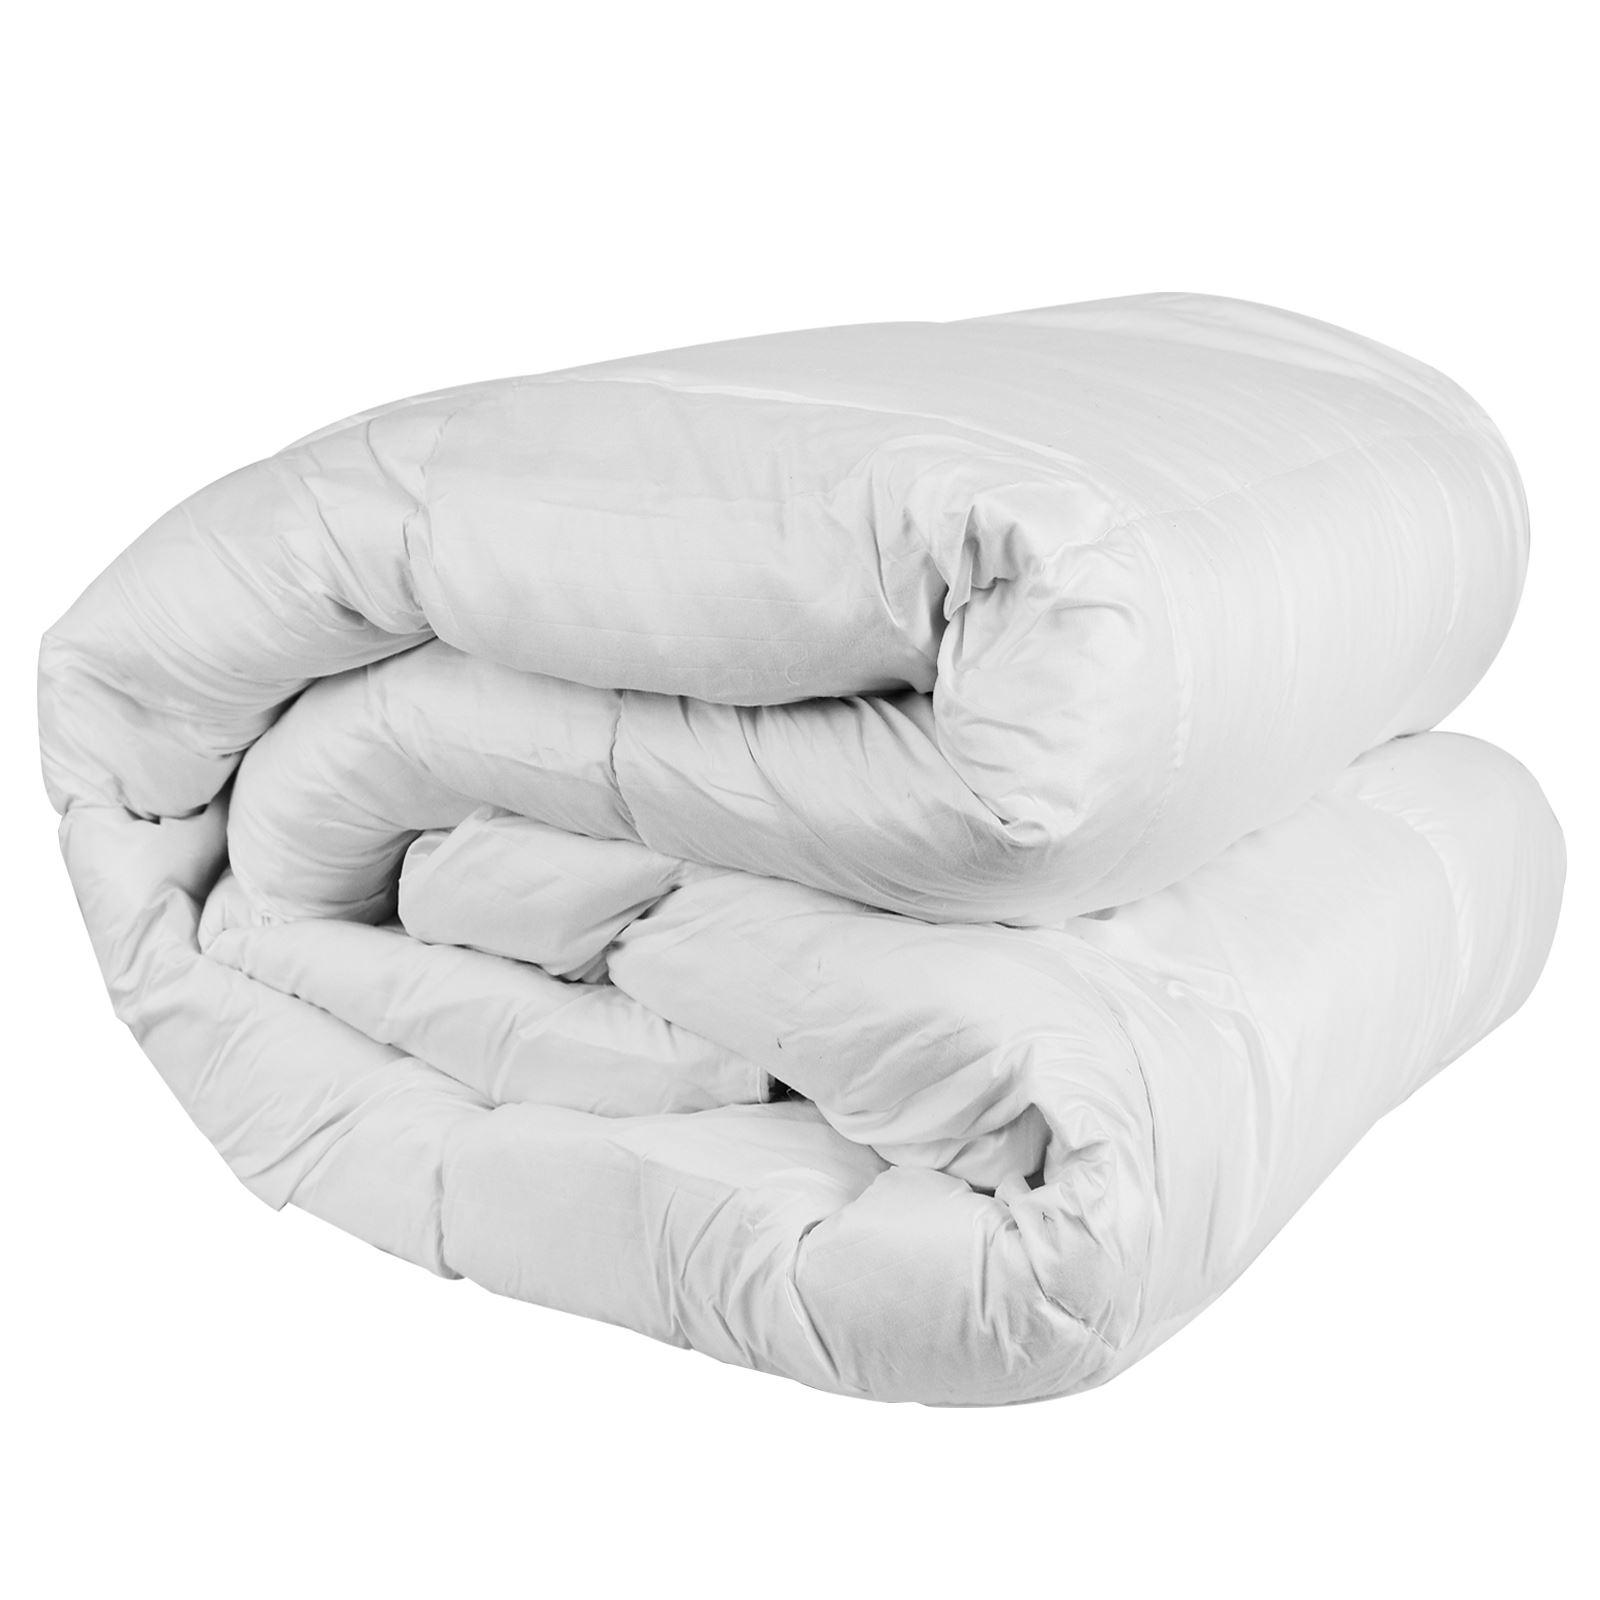 Lujo-Pluma-De-Pato-Abajo-Edredon-Ropa-De-Cama-Edredon-relleno-confortable-13-5-15-Tog miniatura 7